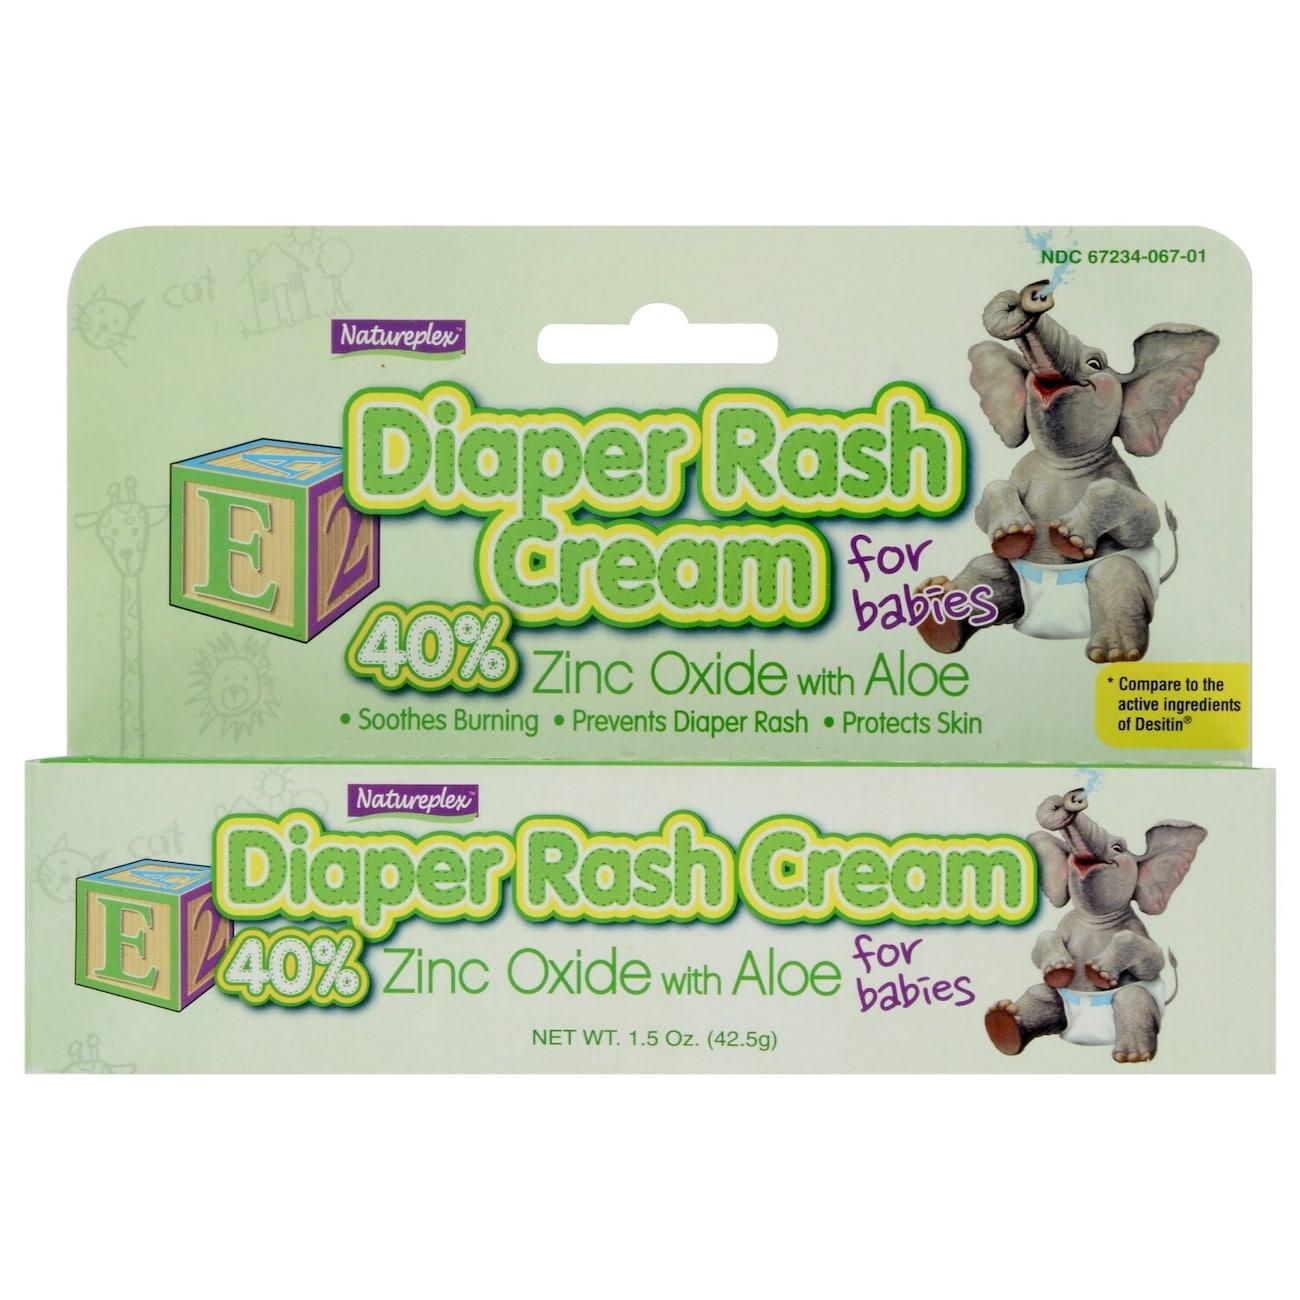 d7a459b58f5b Baby Shower Supplies - Dollar Tree, Inc.